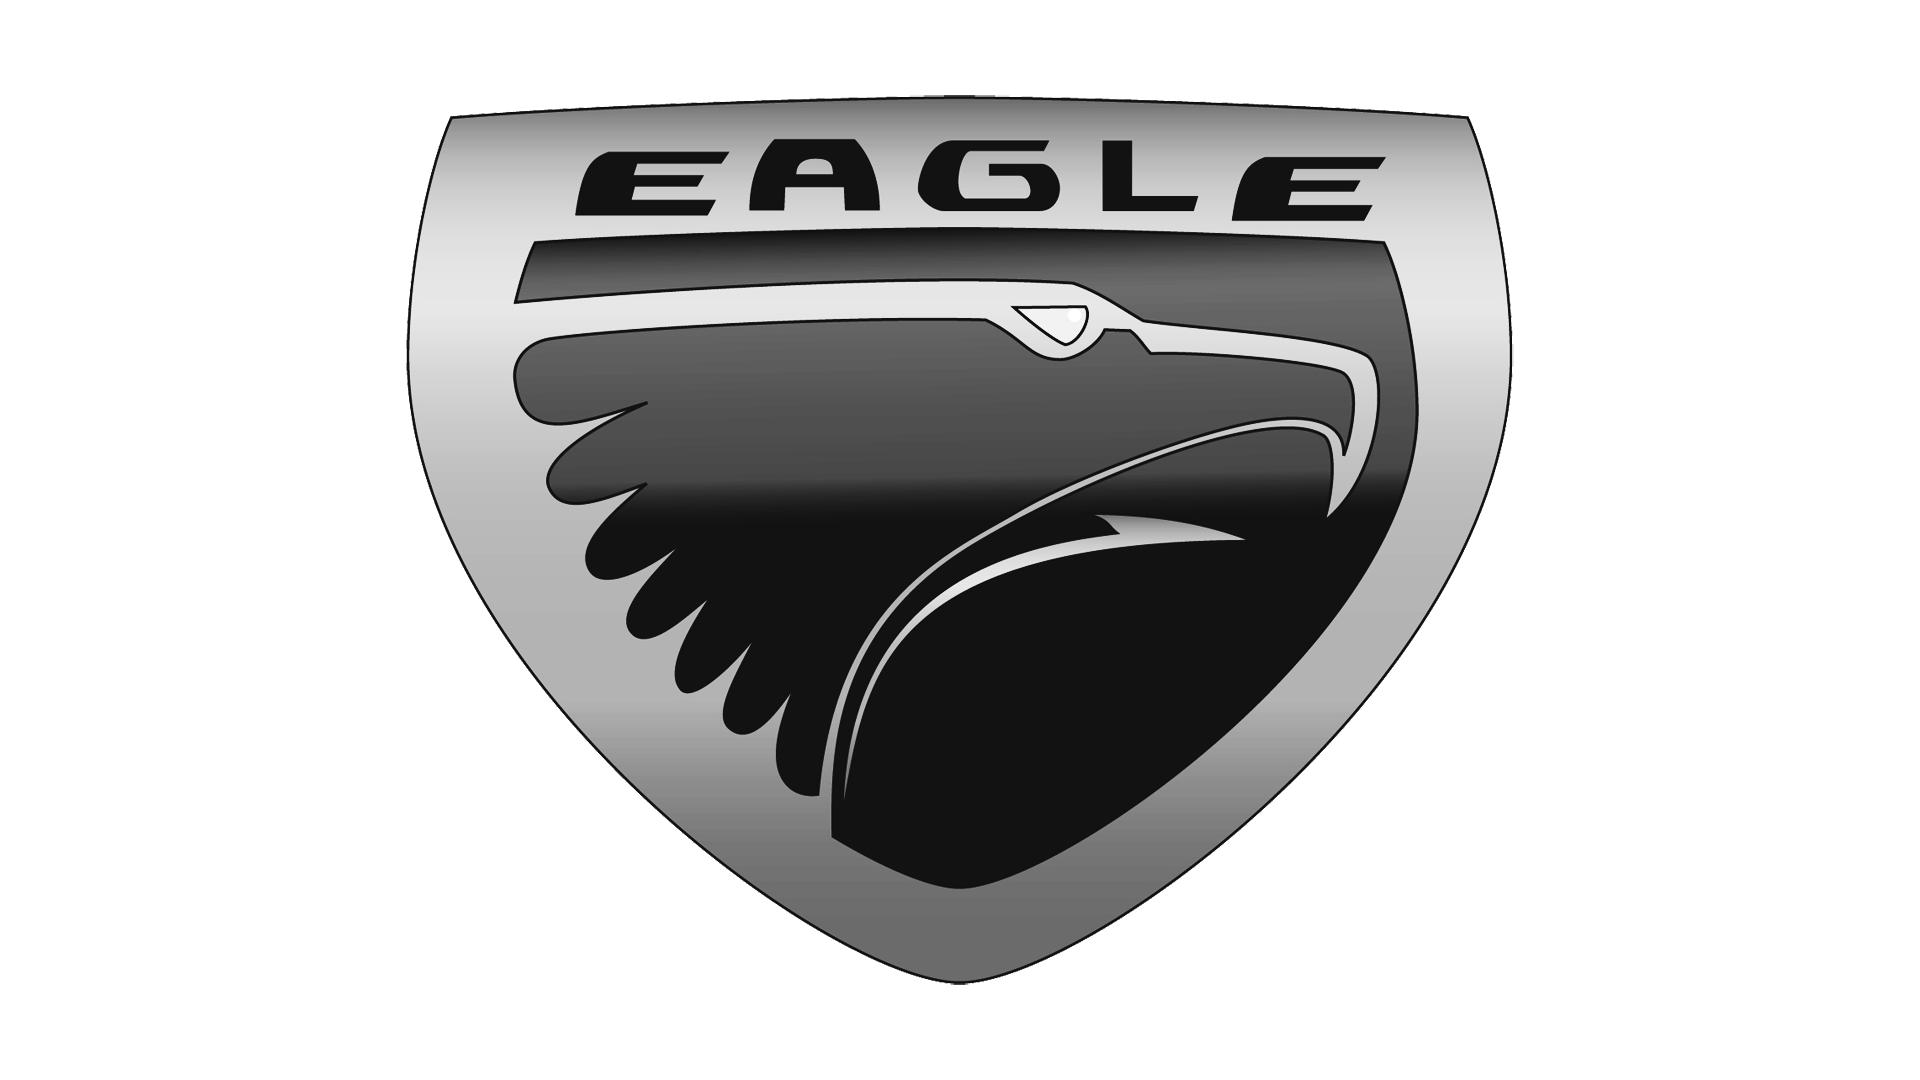 Eagle Logo Hd Png Information Carlogos Org